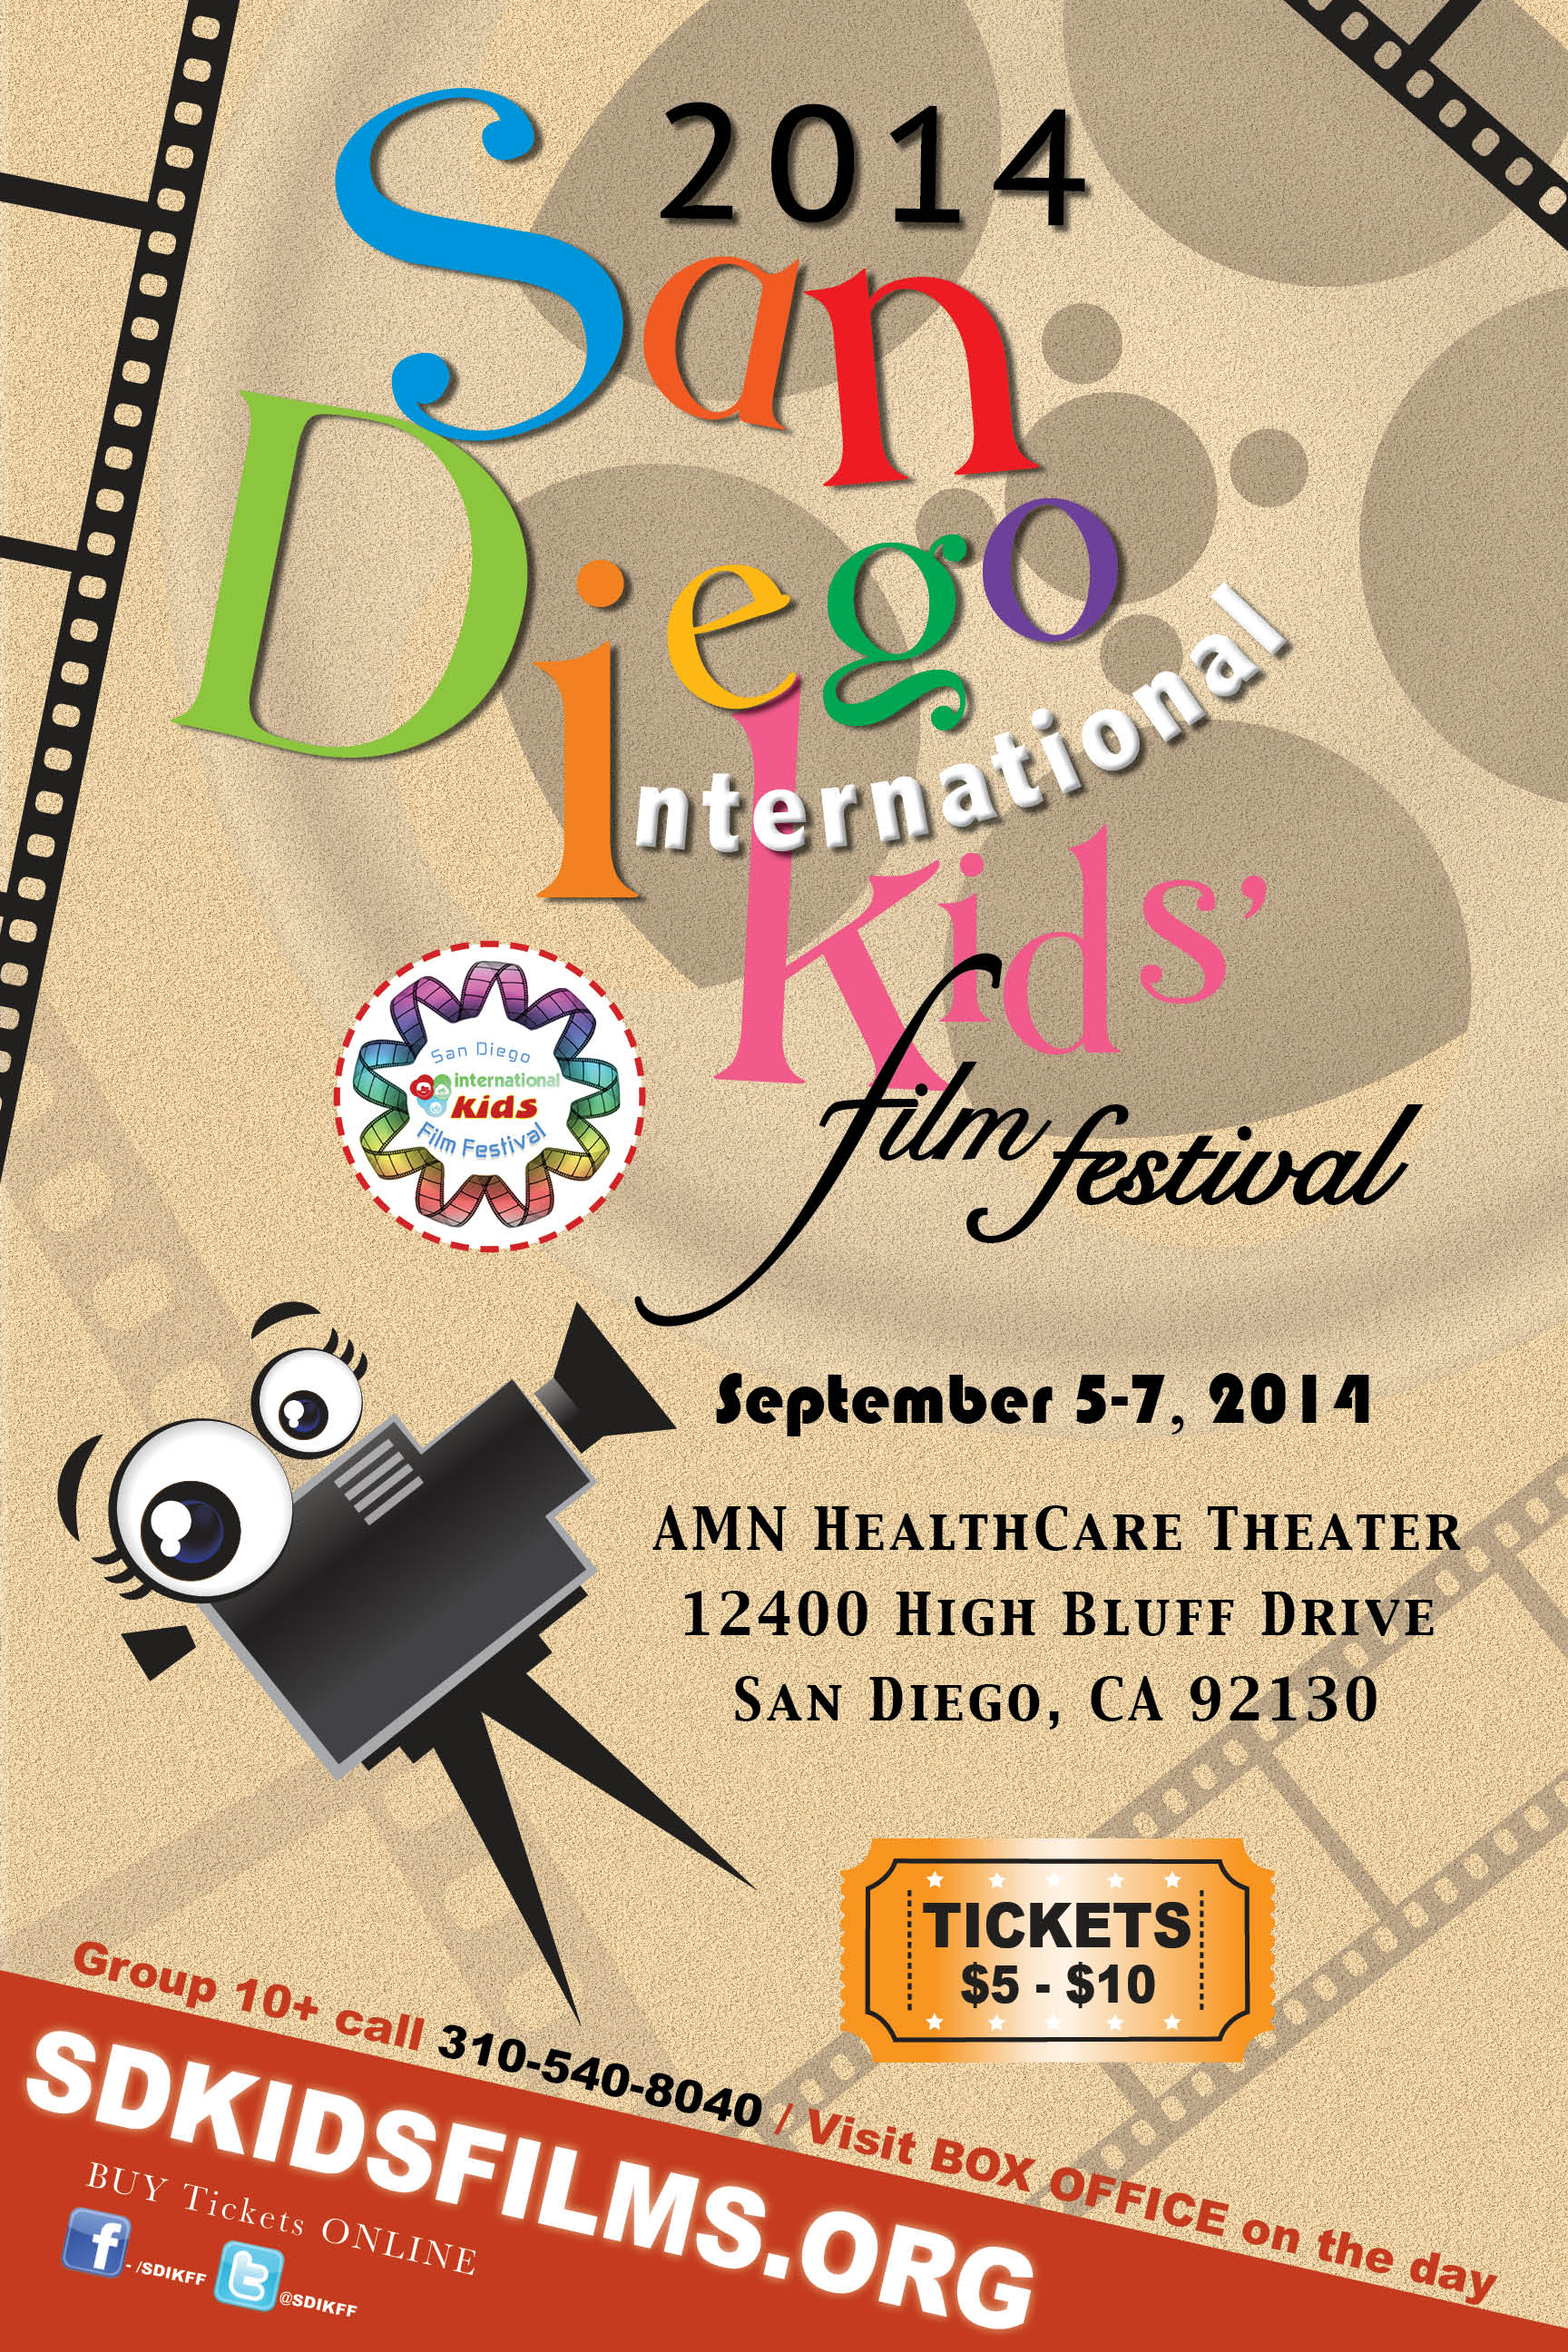 The 2014 San Diego International Kids' Film Festival